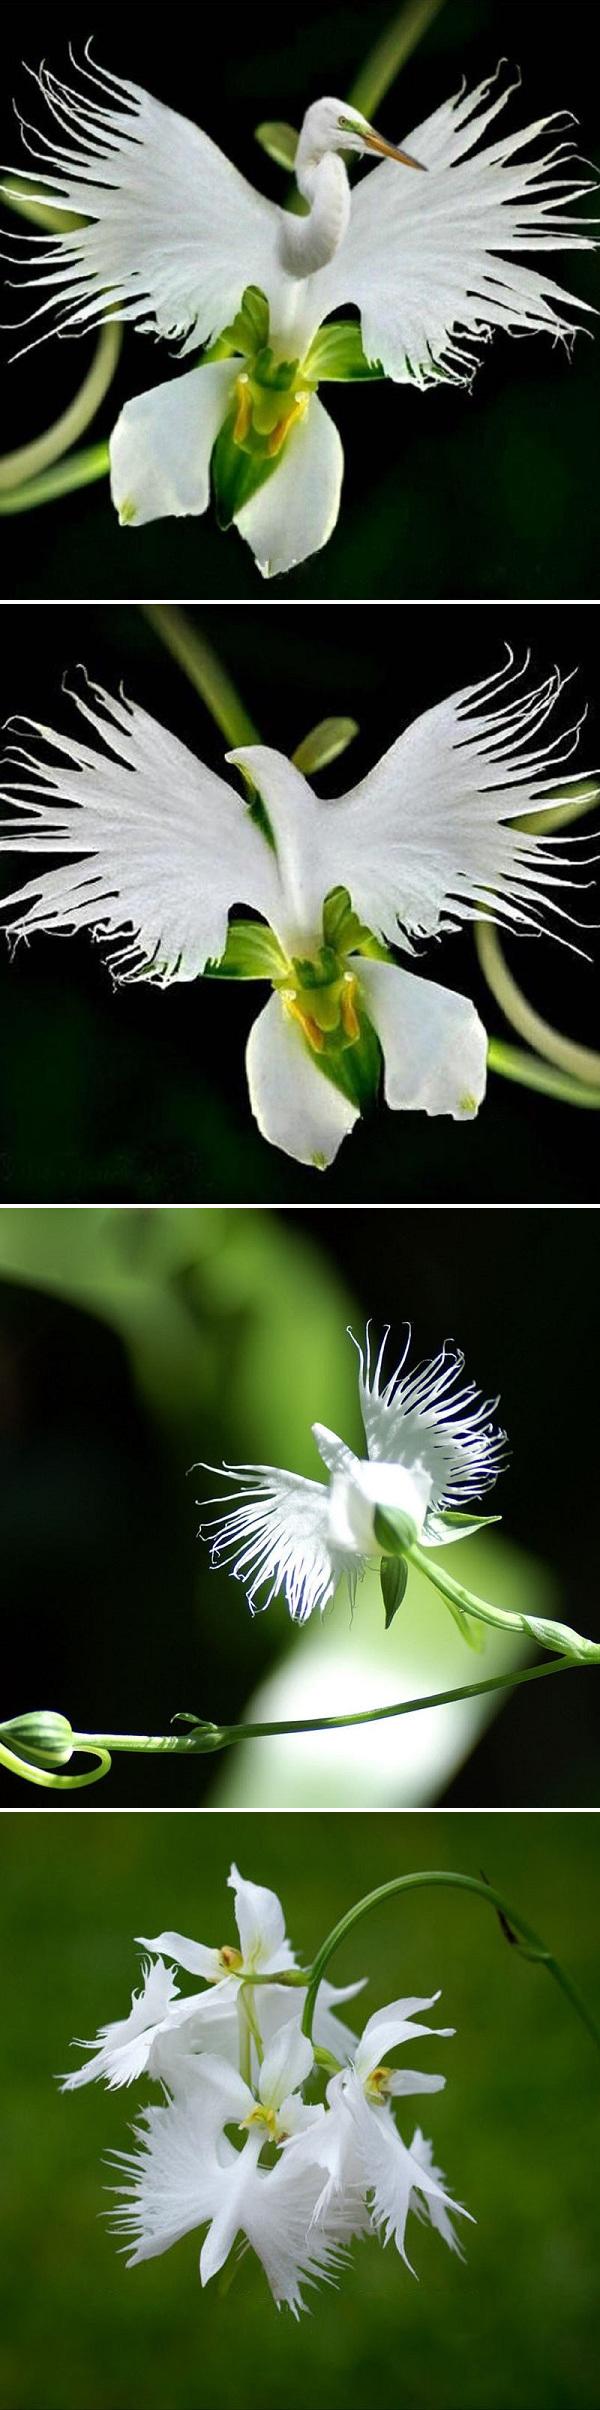 Us pcs japanese egret flowers seeds white egret orchid seeds